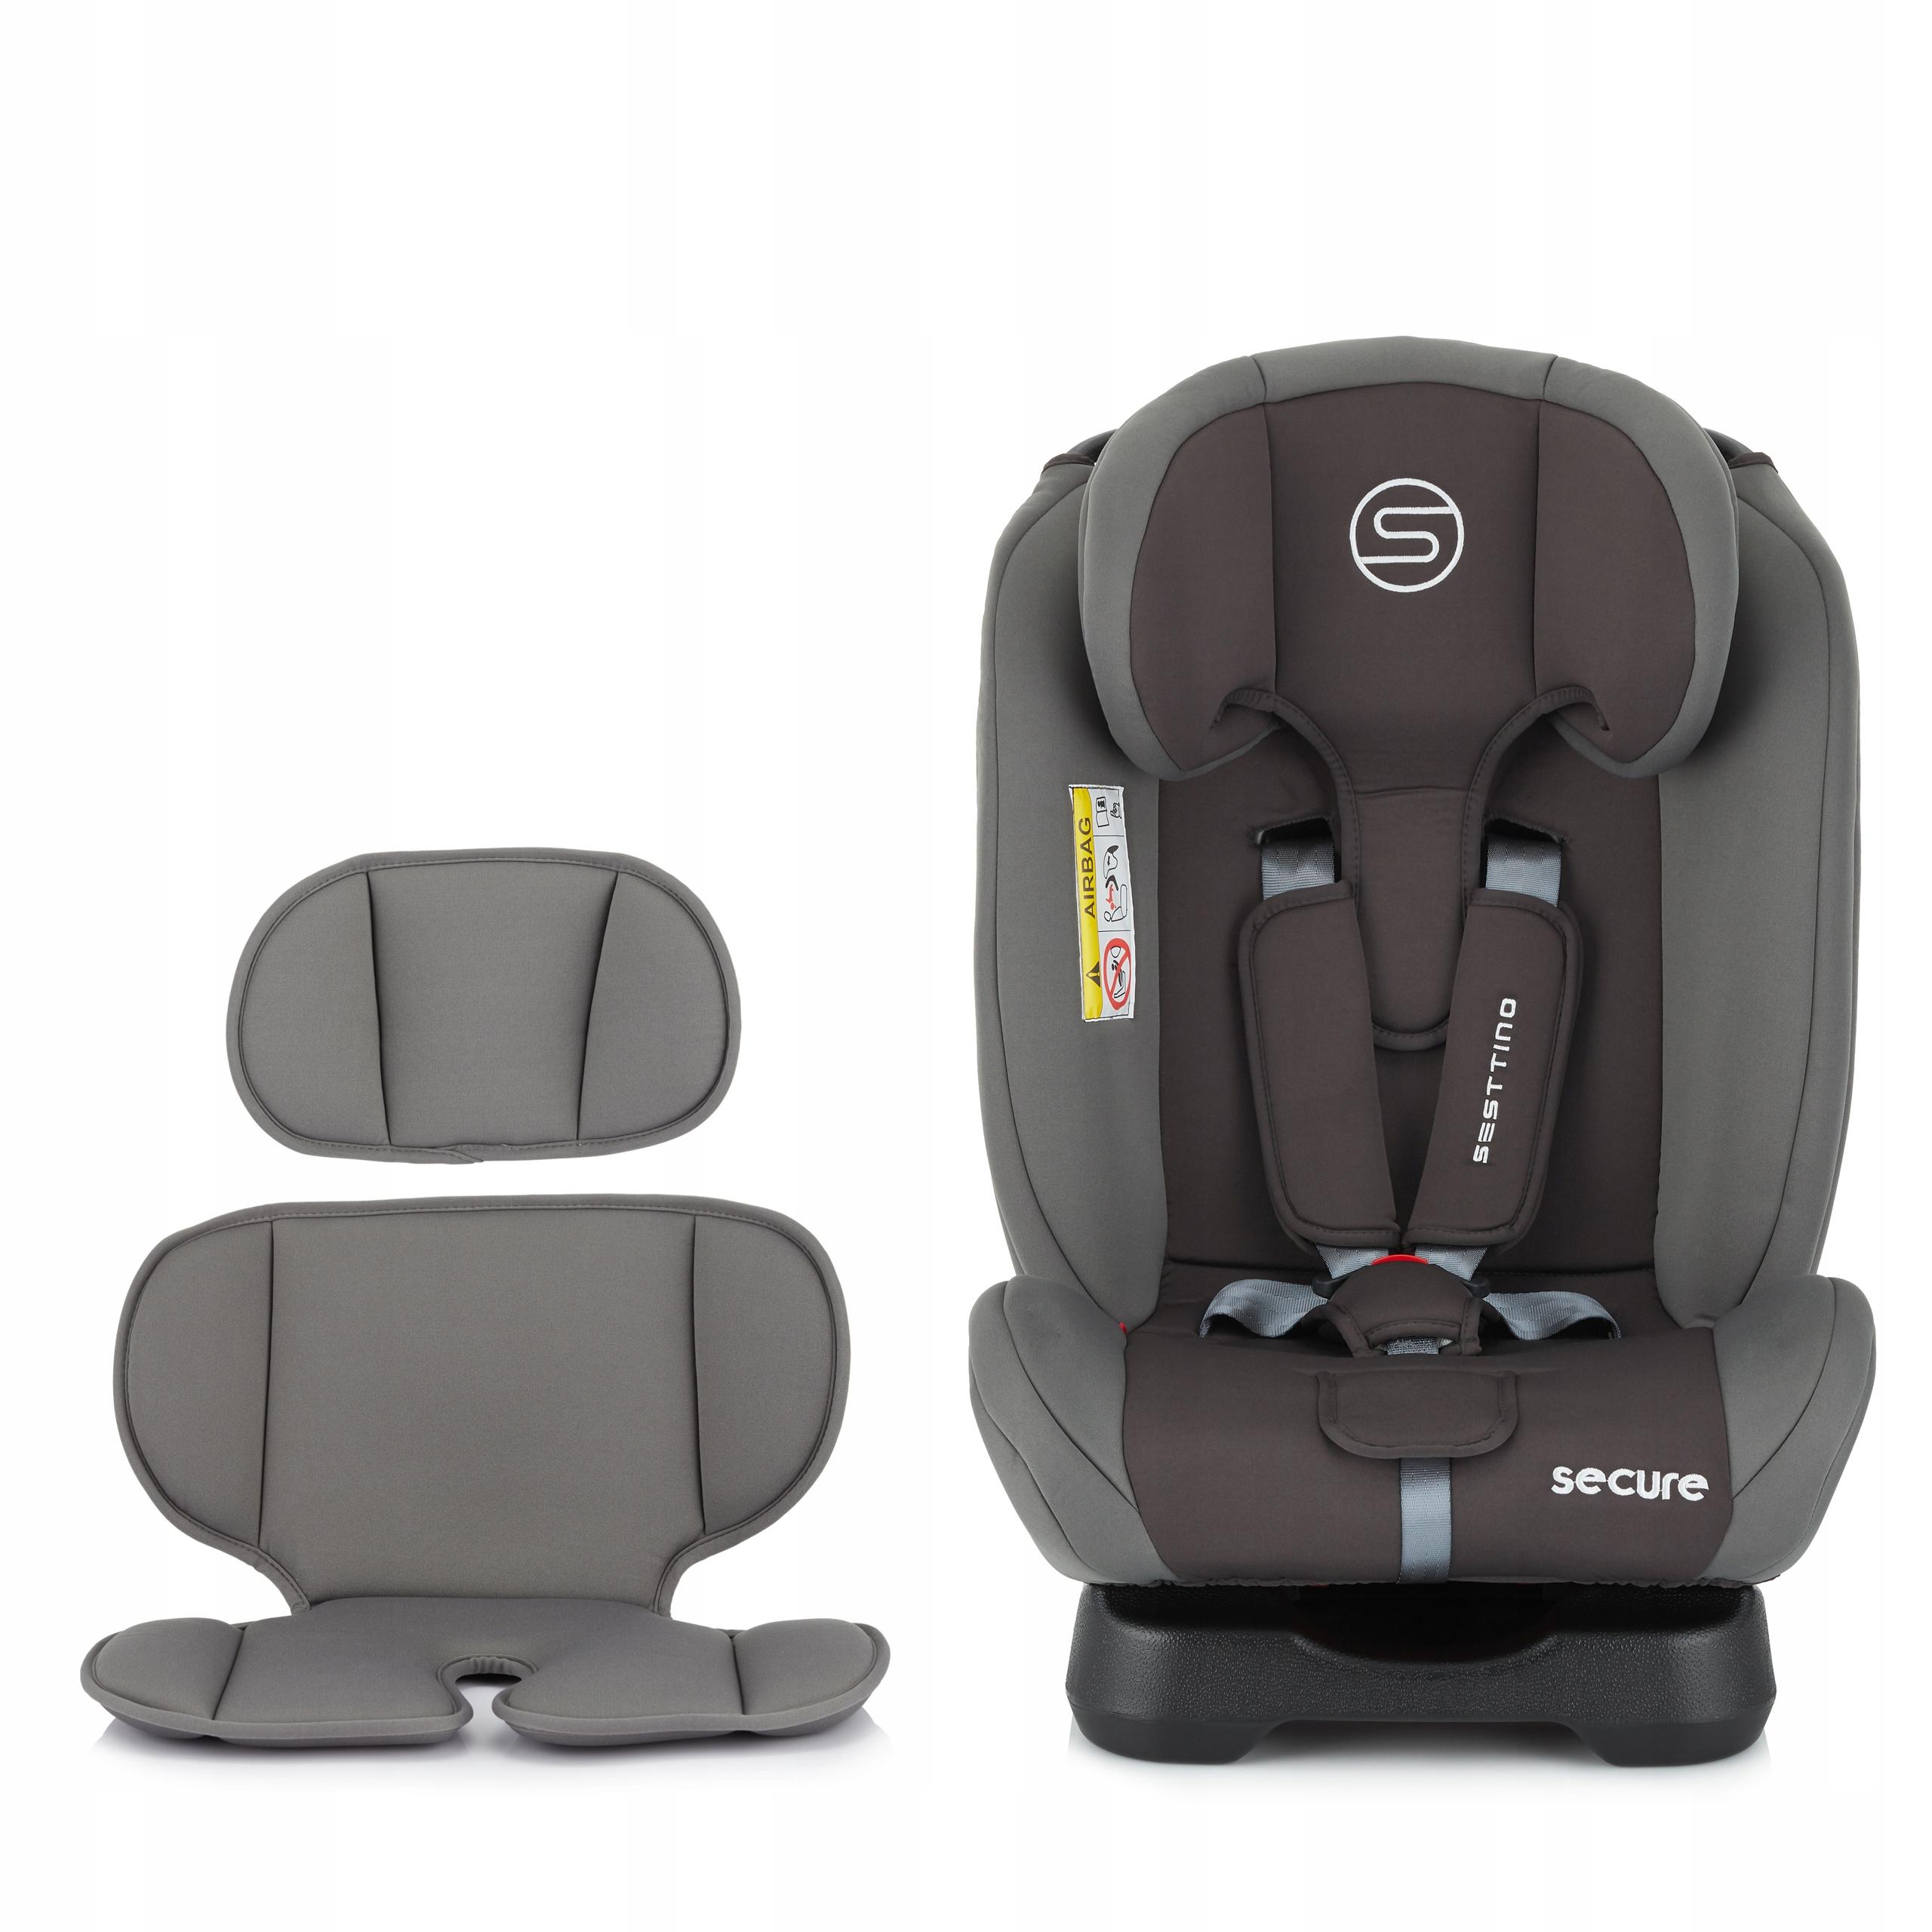 Fotelik samochodowy Sesttino Secure PRO 0-36kg Kategoria wagowa 0-36 kg